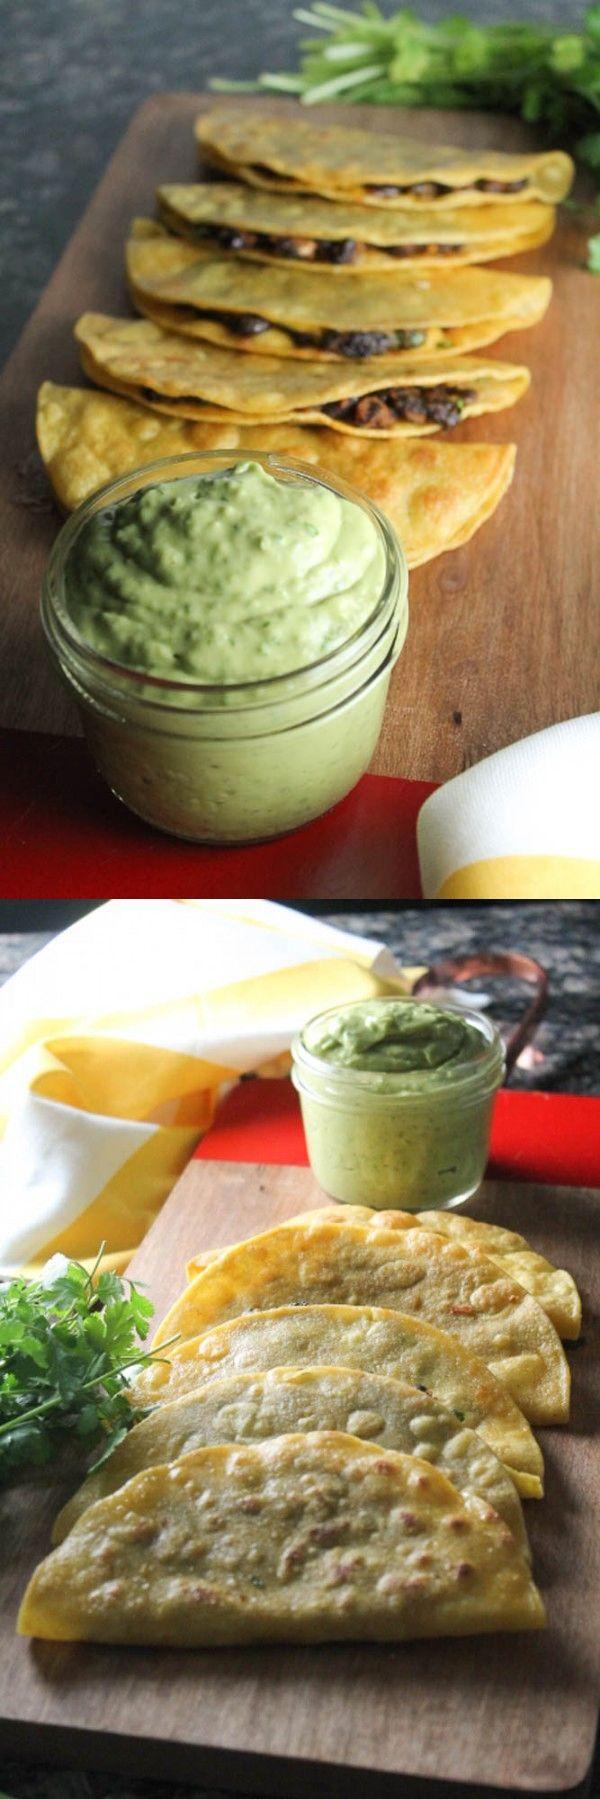 Crispy Black Bean Tacos with Avocado Lime Sauce